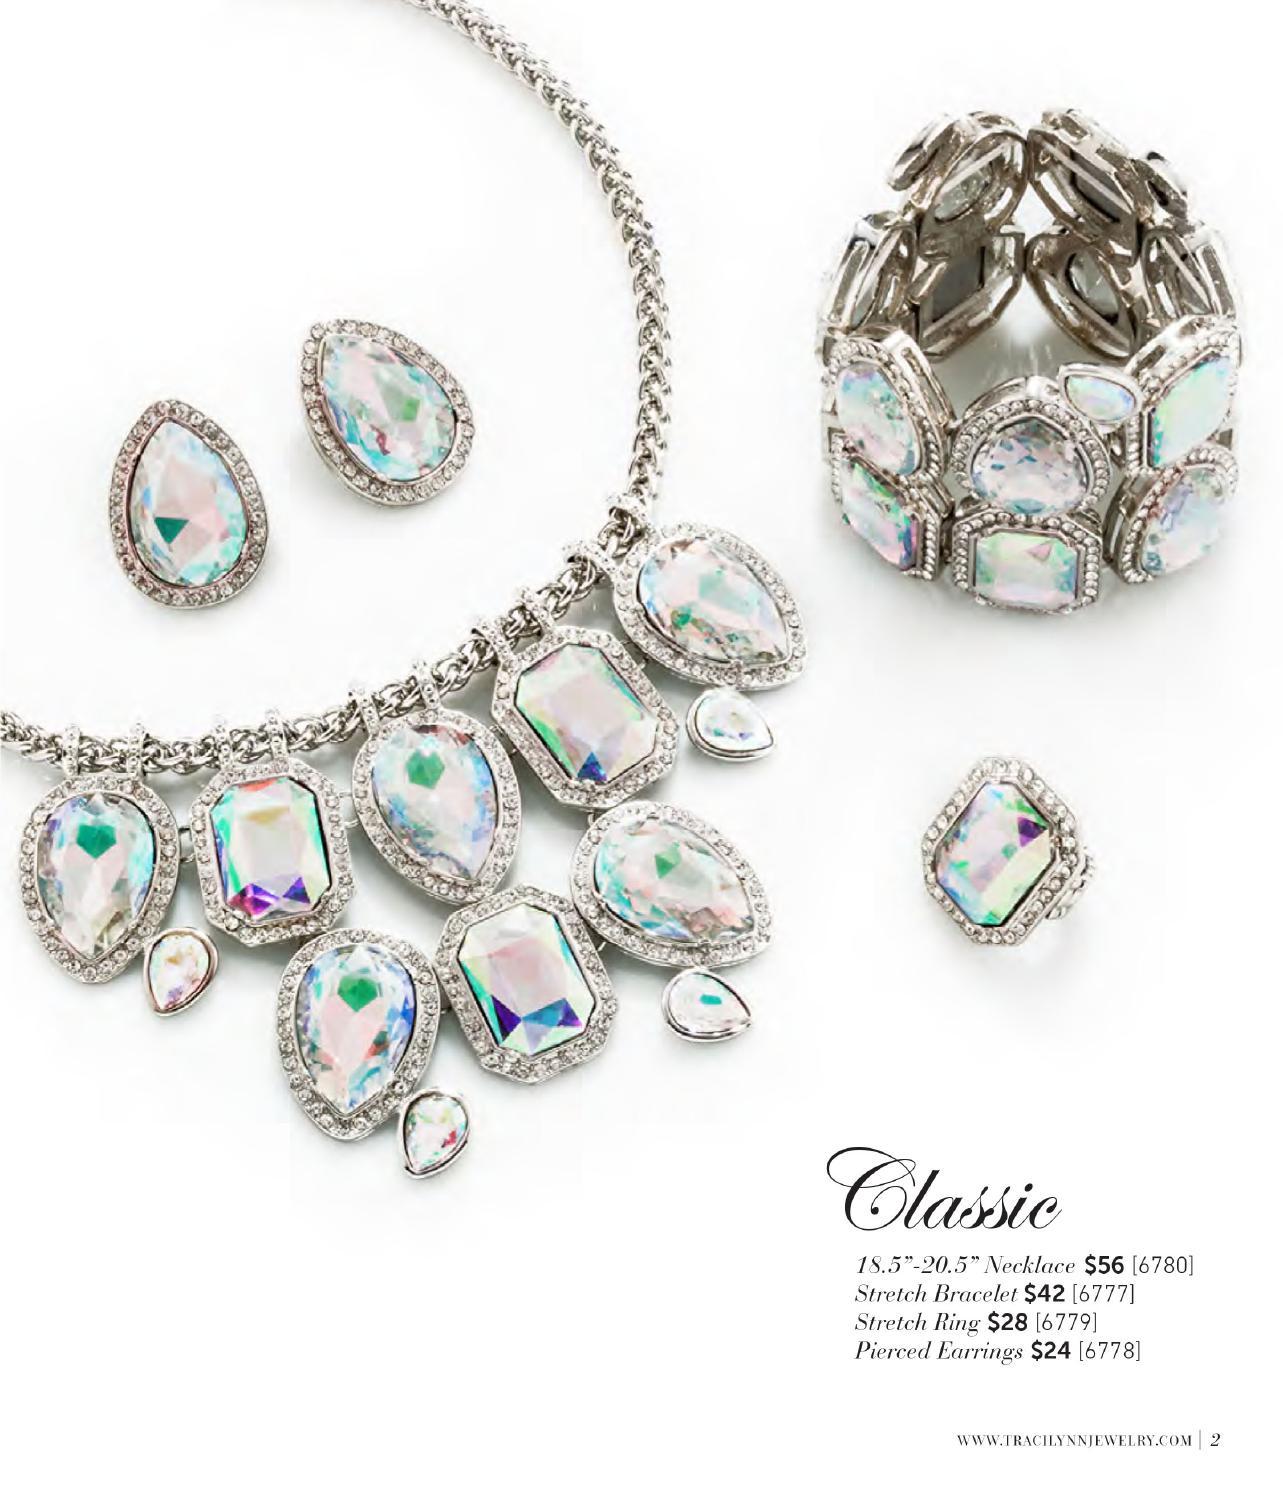 Stunning 2015 Catalog By Traci Lynn Jewelry Issuu Traci Lynn Fashion Jewelry 2016 Traci Lynn Fashion Jewelry Convention wedding jewelry Traci Lynn Fashion Jewelry